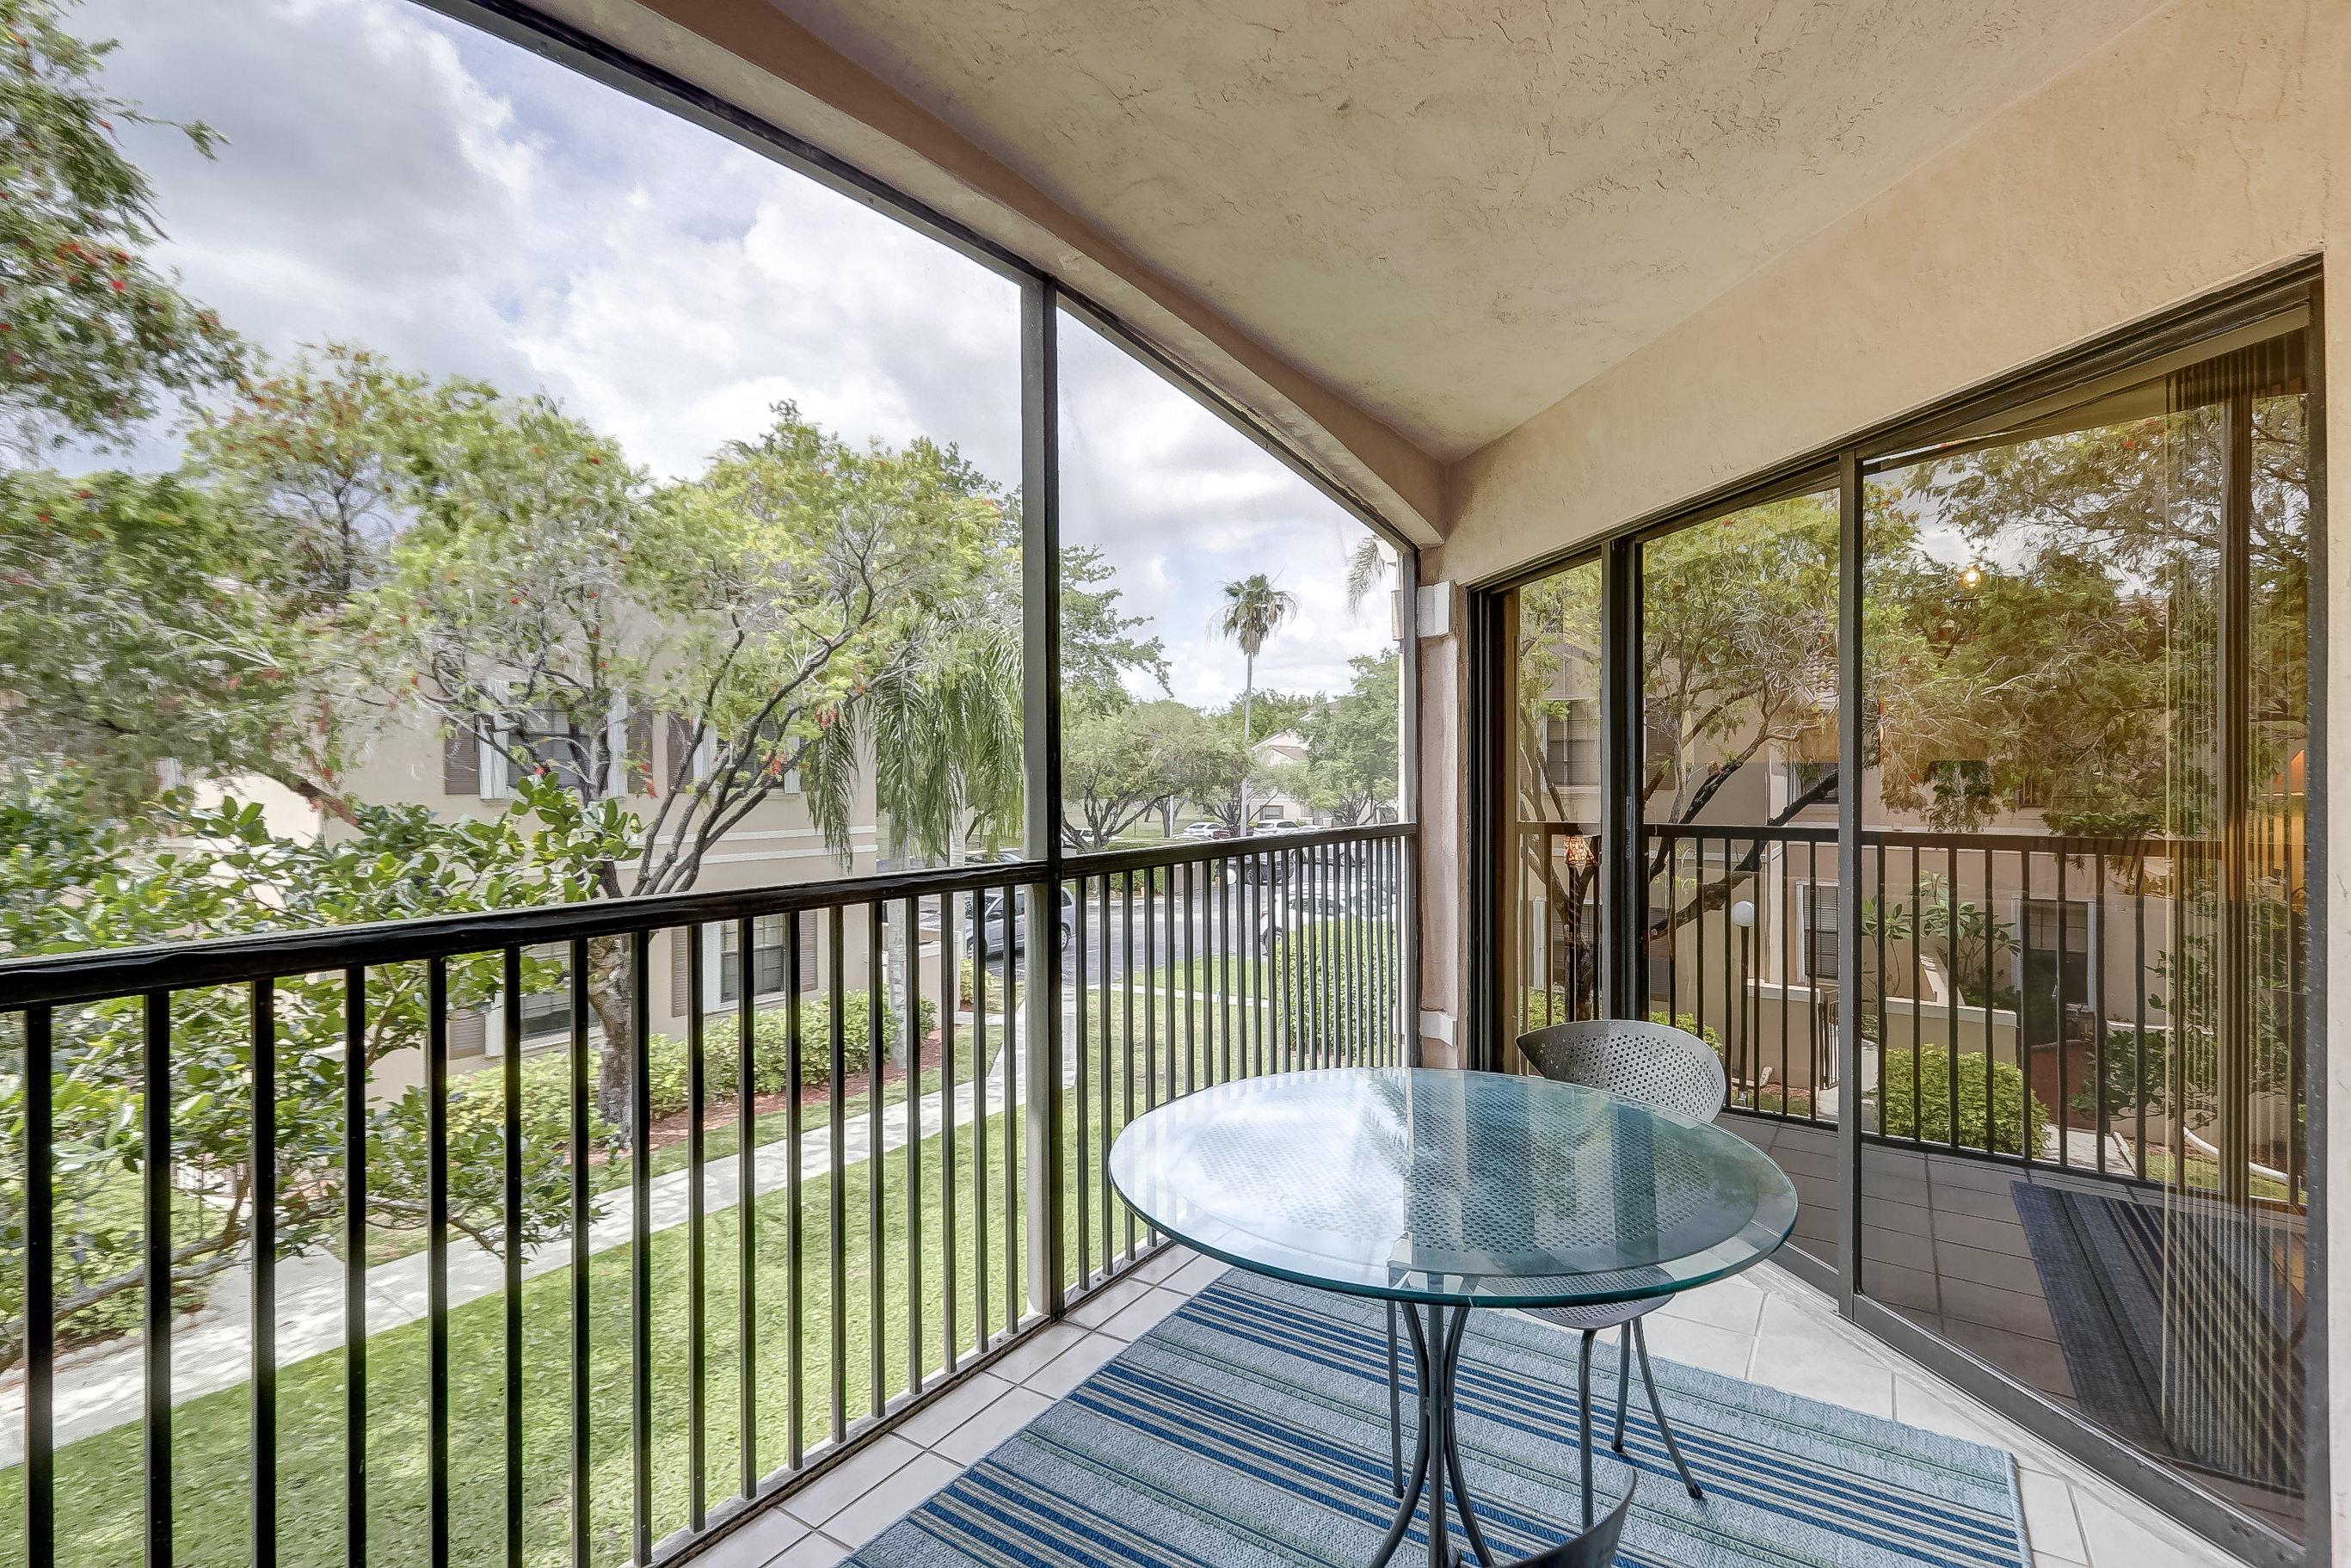 402 SW 158th Terrace 204 Pembroke Pines, FL 33027 photo 34